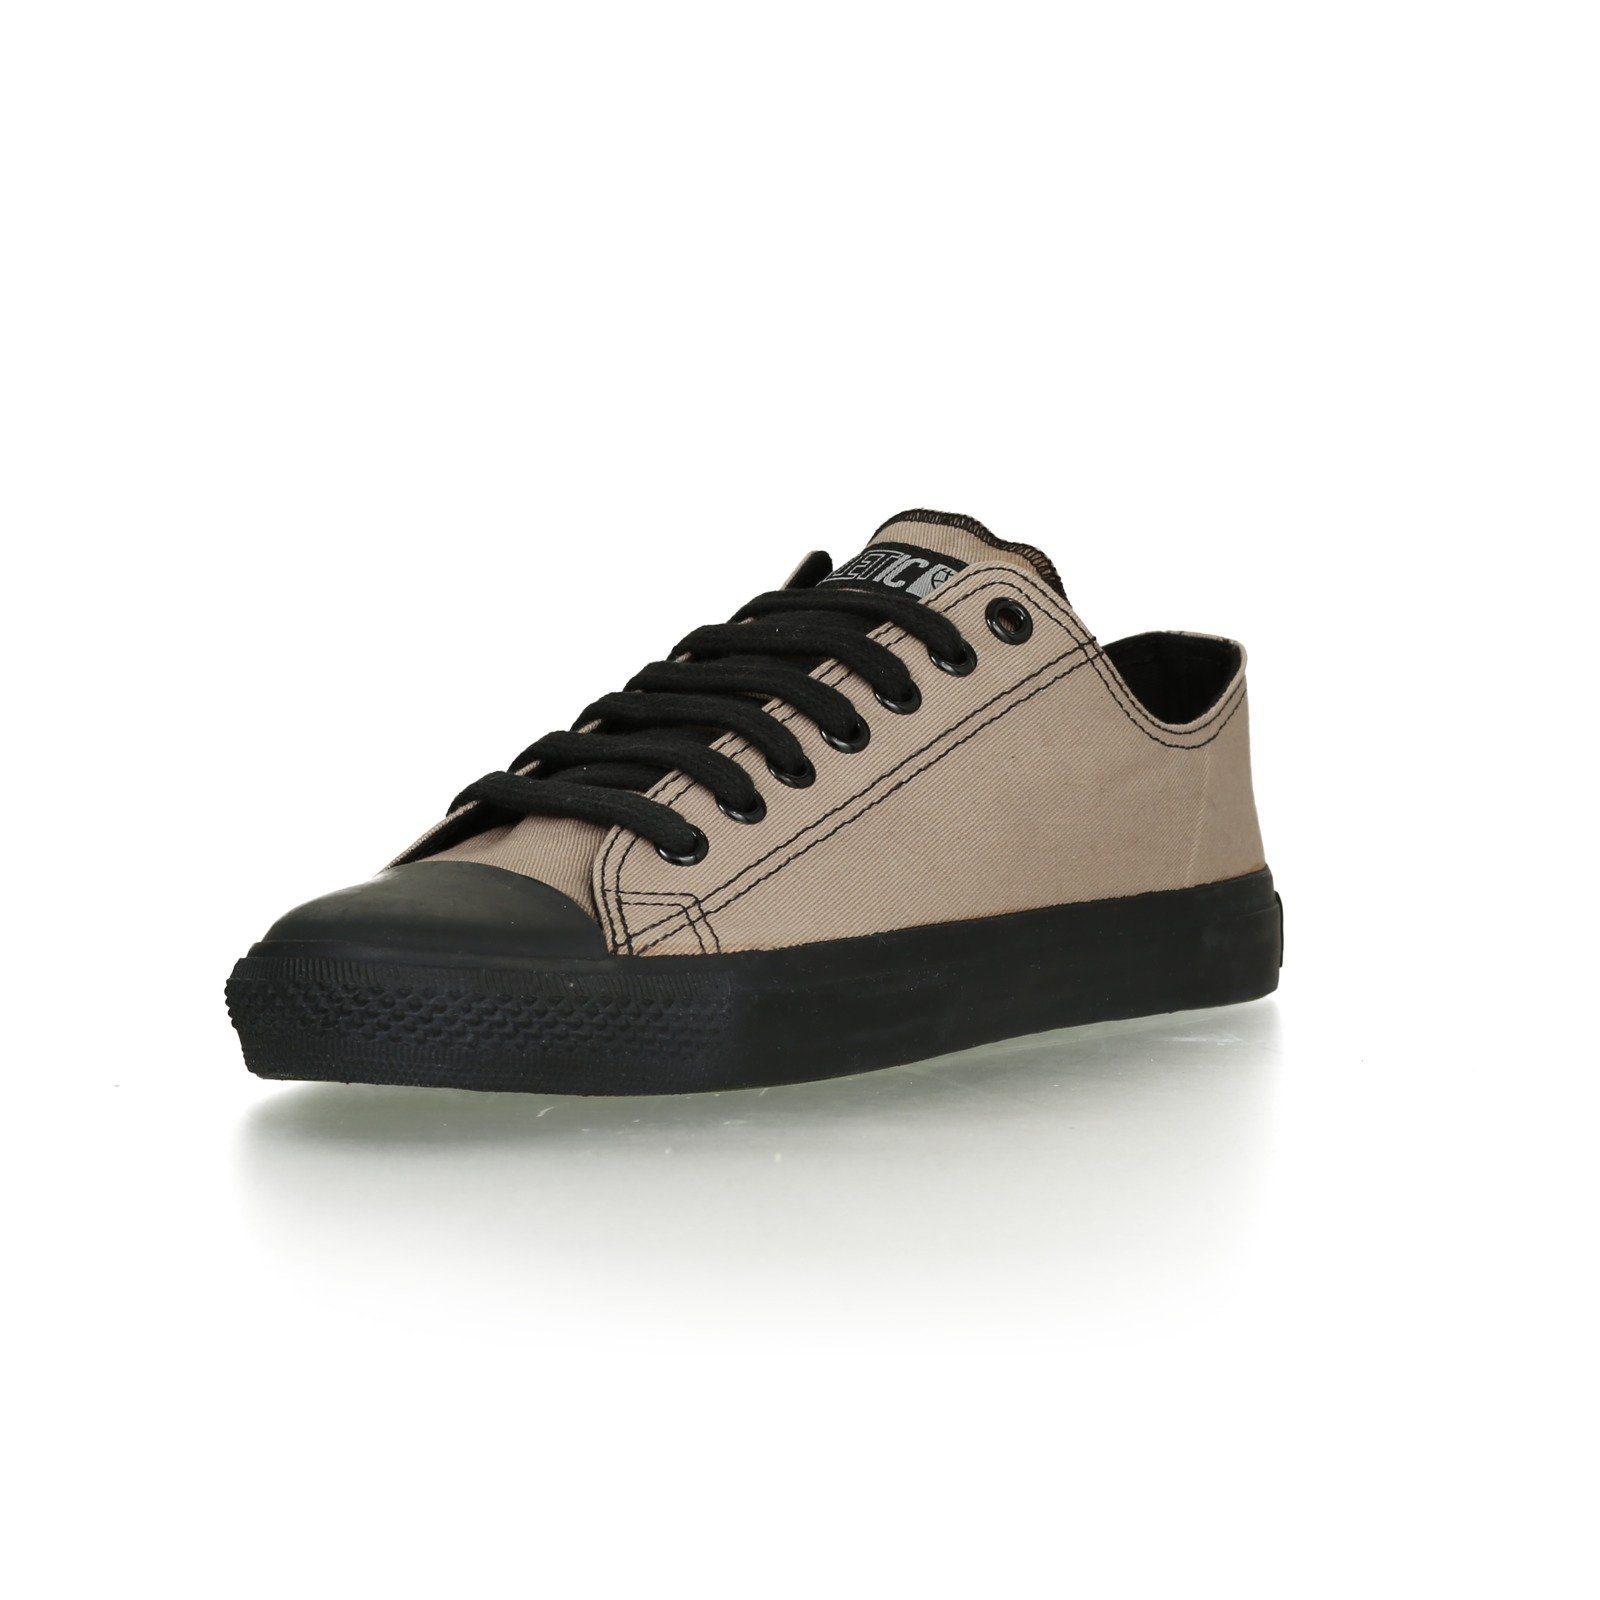 ETHLETIC Sneaker aus nachhaltiger Produktion Black Cap Lo Cut Classic online kaufen  Moon Rock Grey | Jet Blac